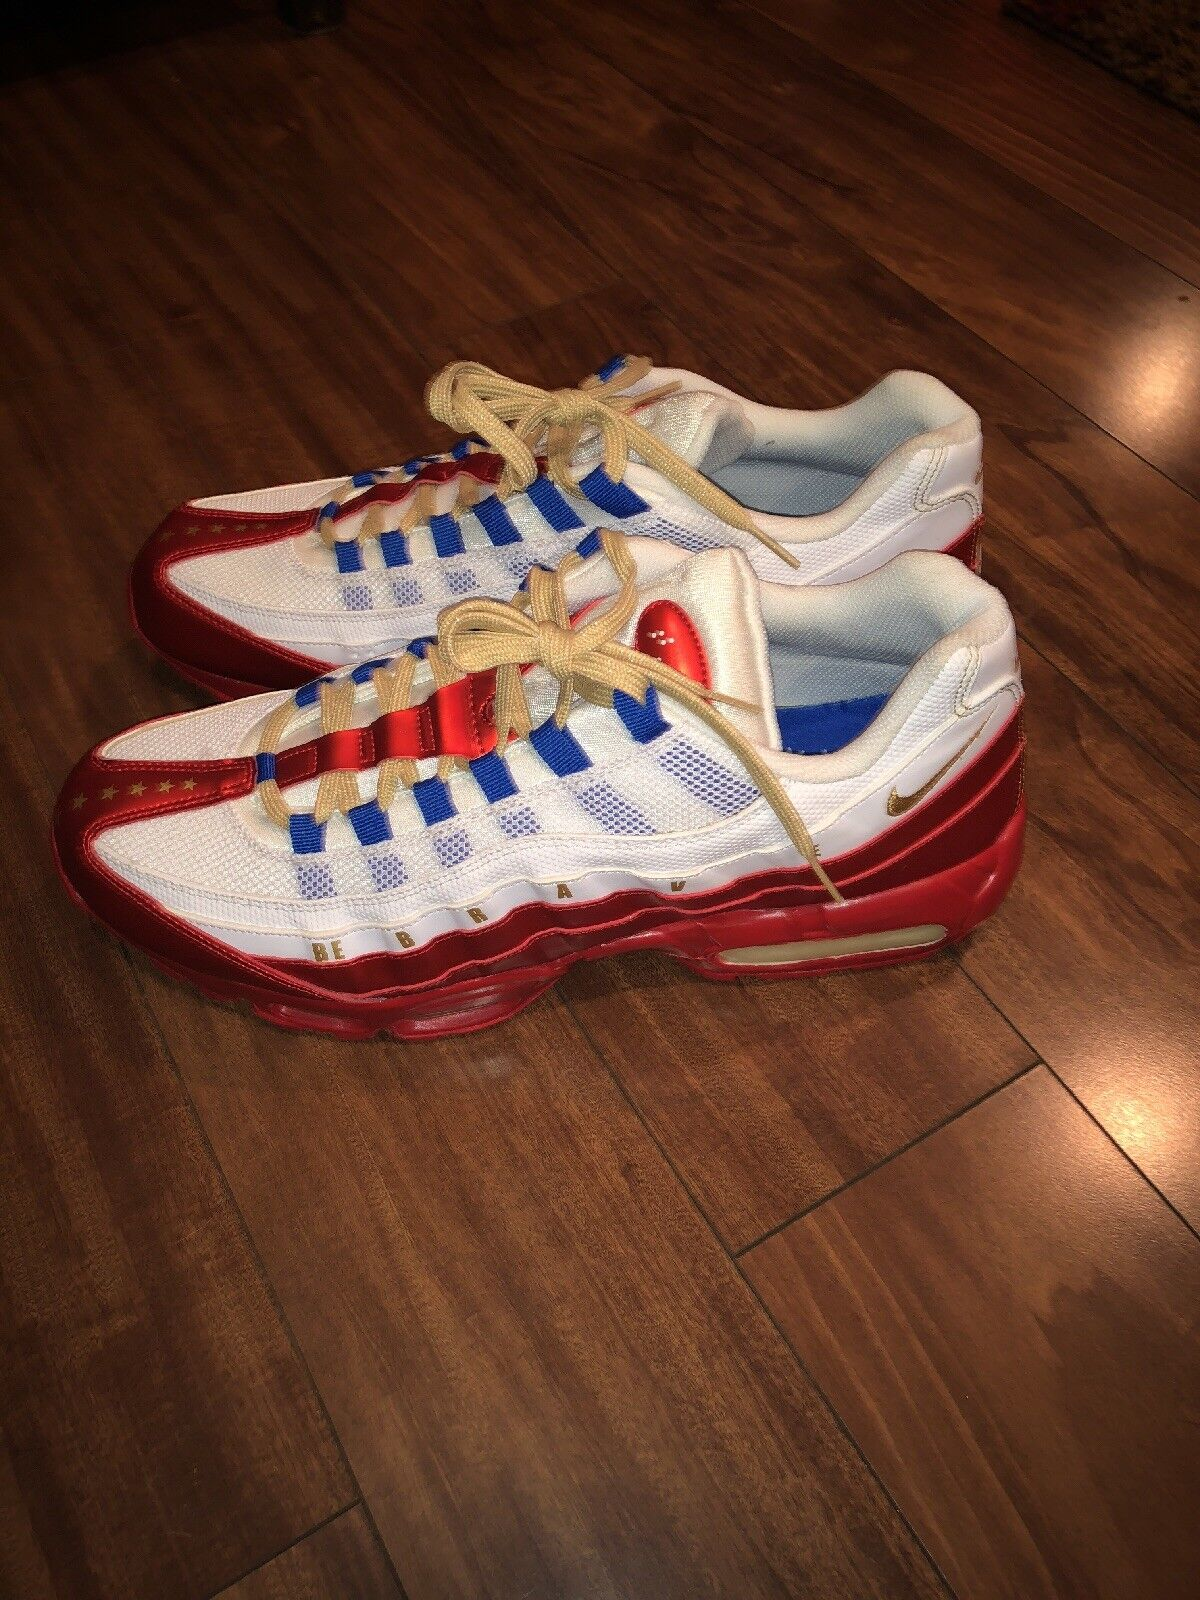 Vintage  New Nike shoes Air Max 95 LE Doernbecher gold Mens US Size 15